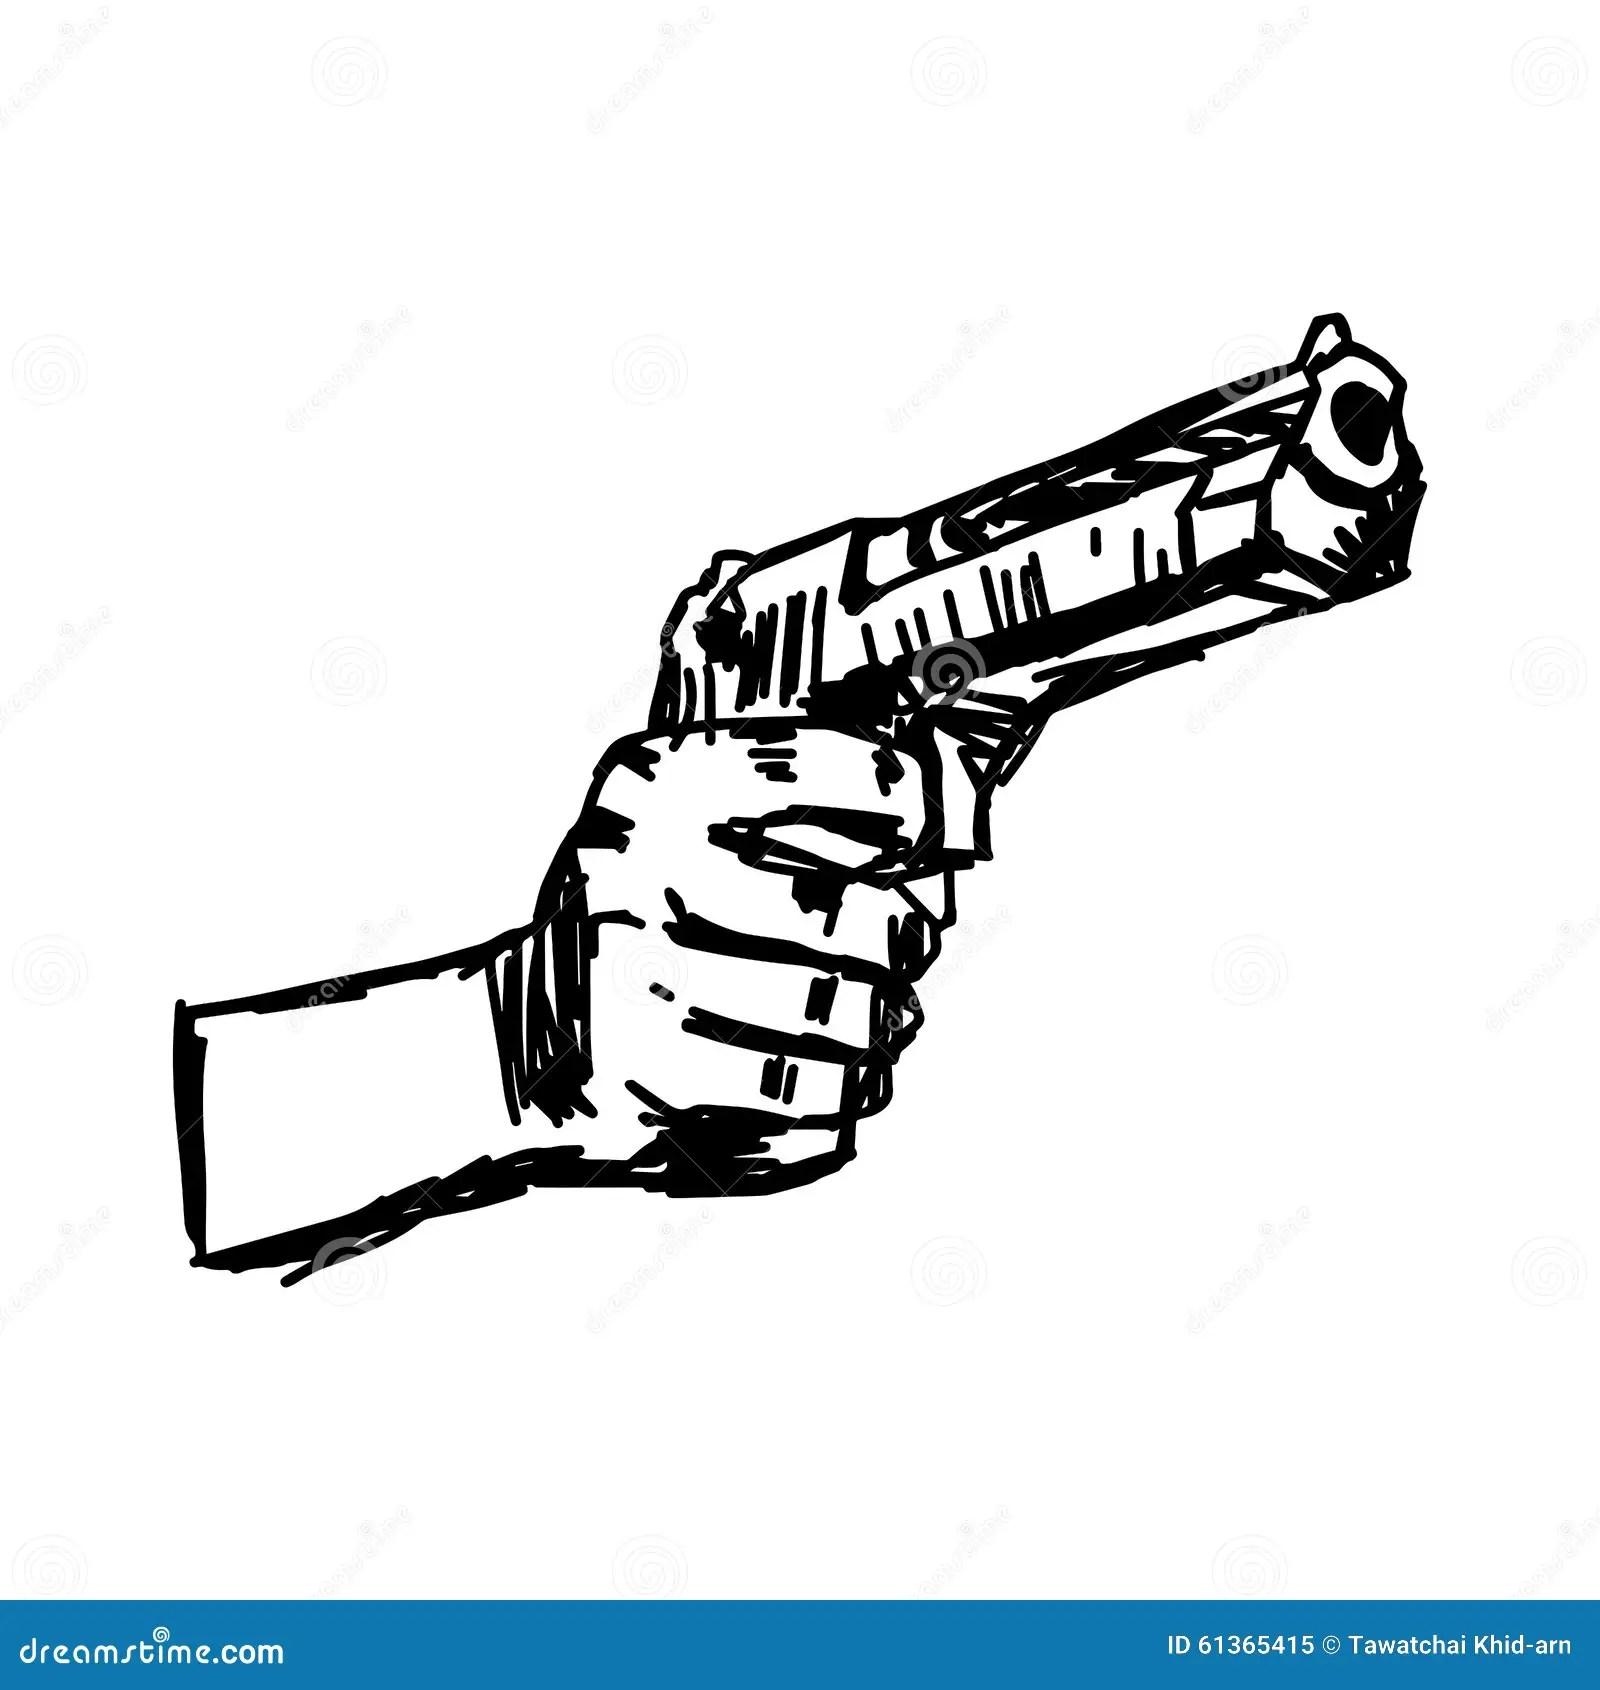 Illustration Vector Doodle Hand Drawn Of Hand Holding Gun